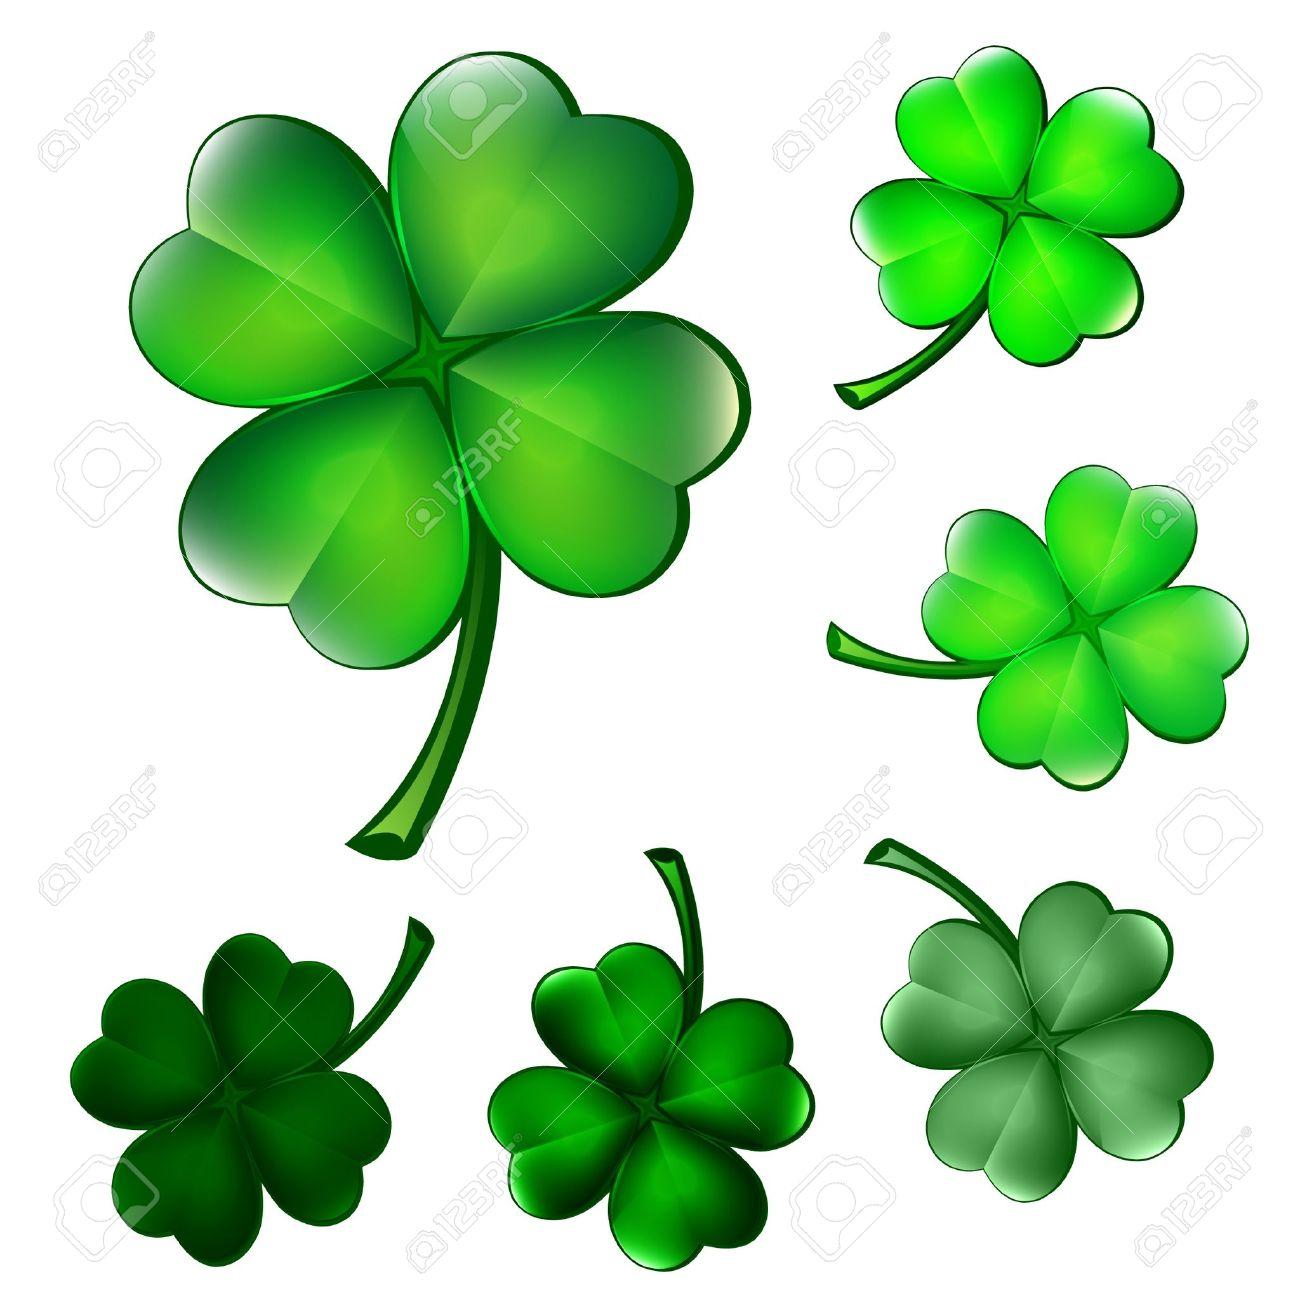 Four-leaf clover illustration Stock Vector - 15470549